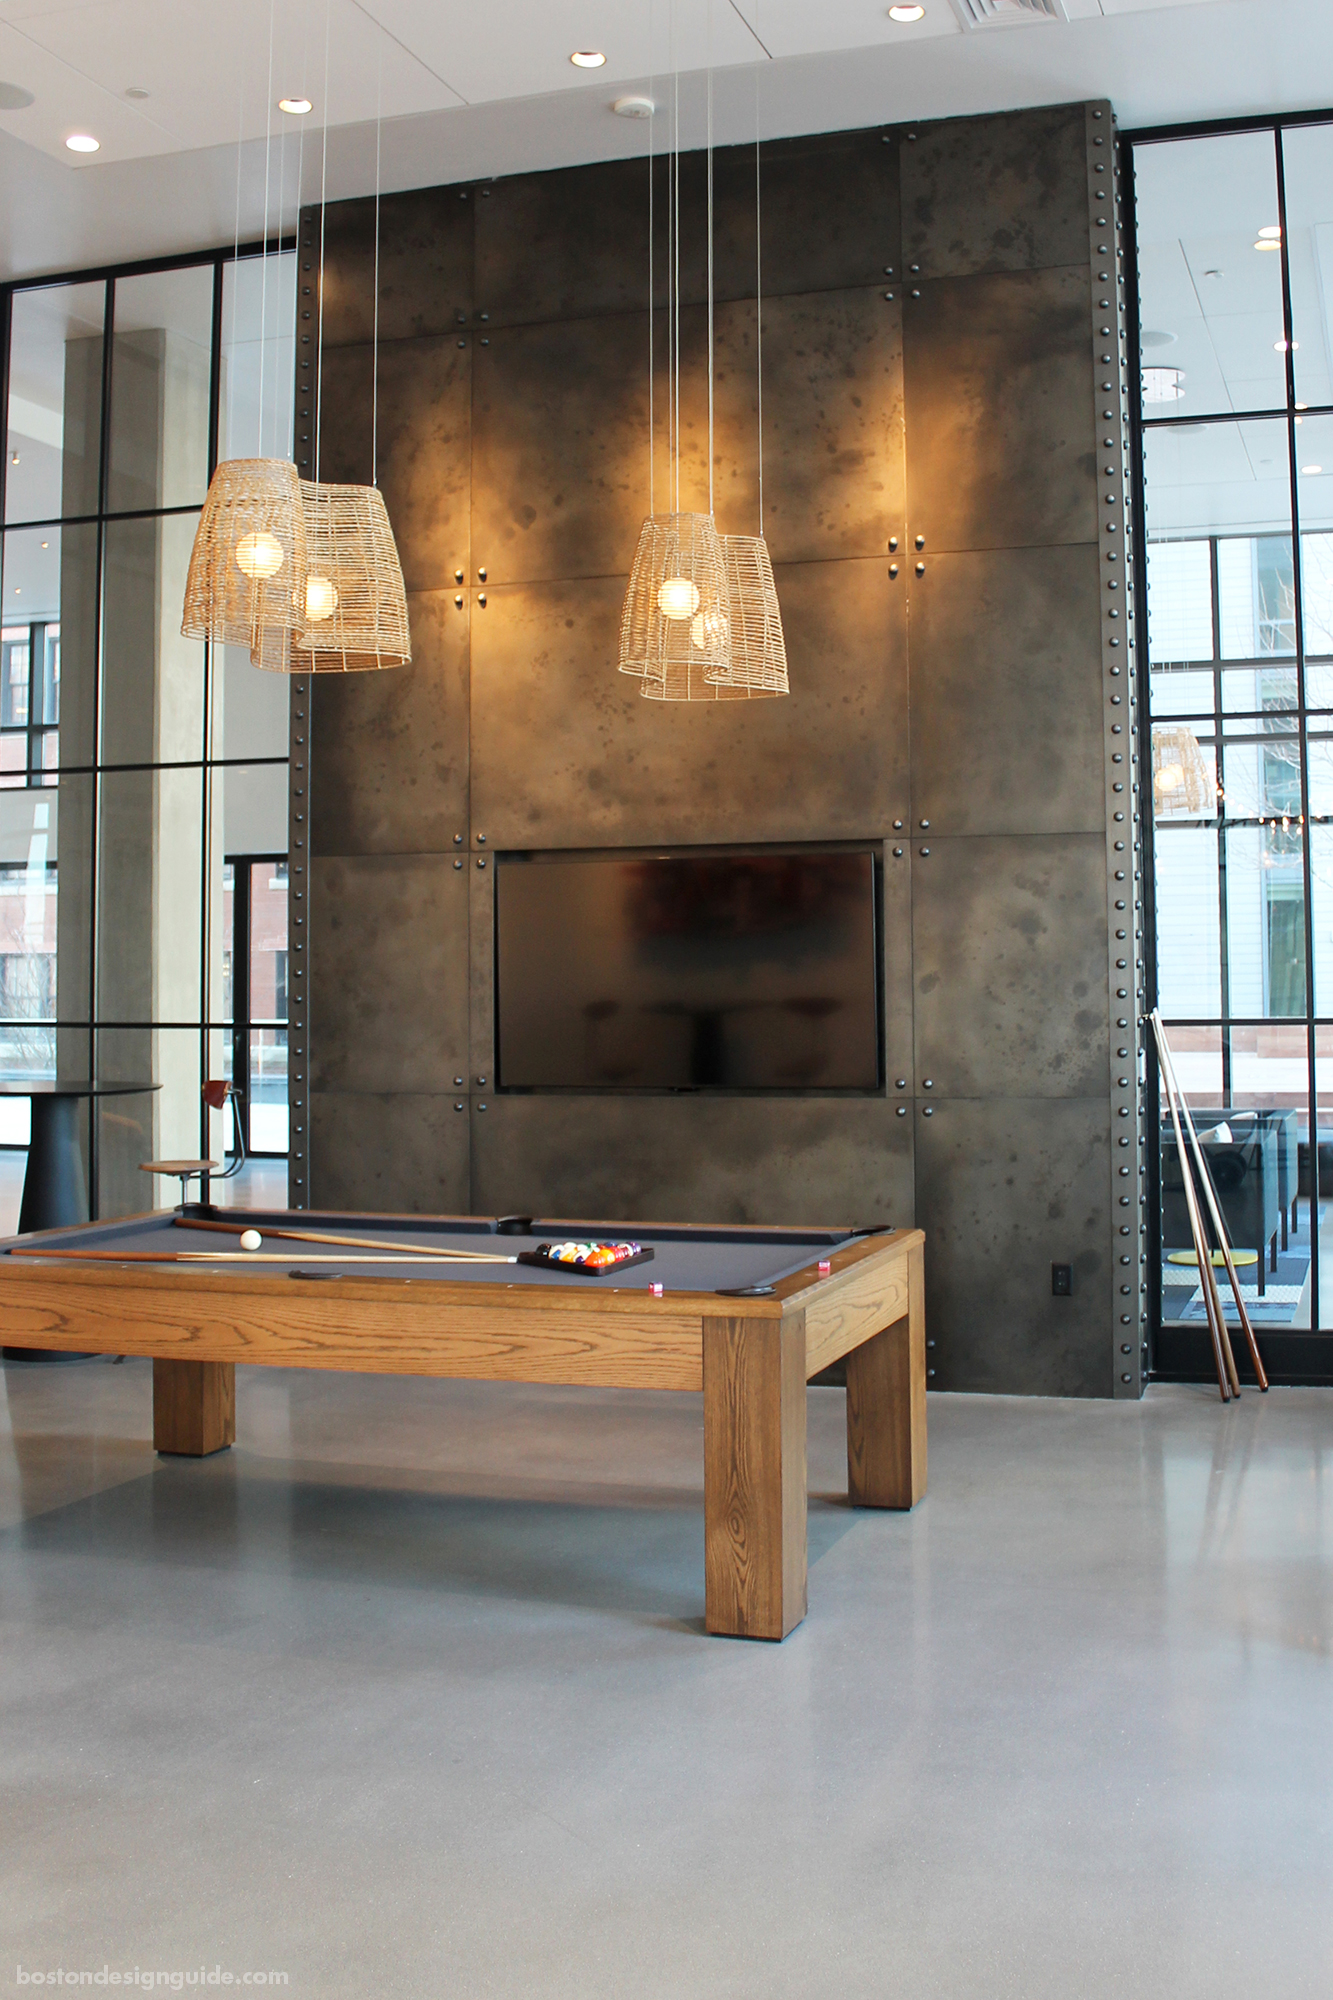 Make Architectural Metalworking